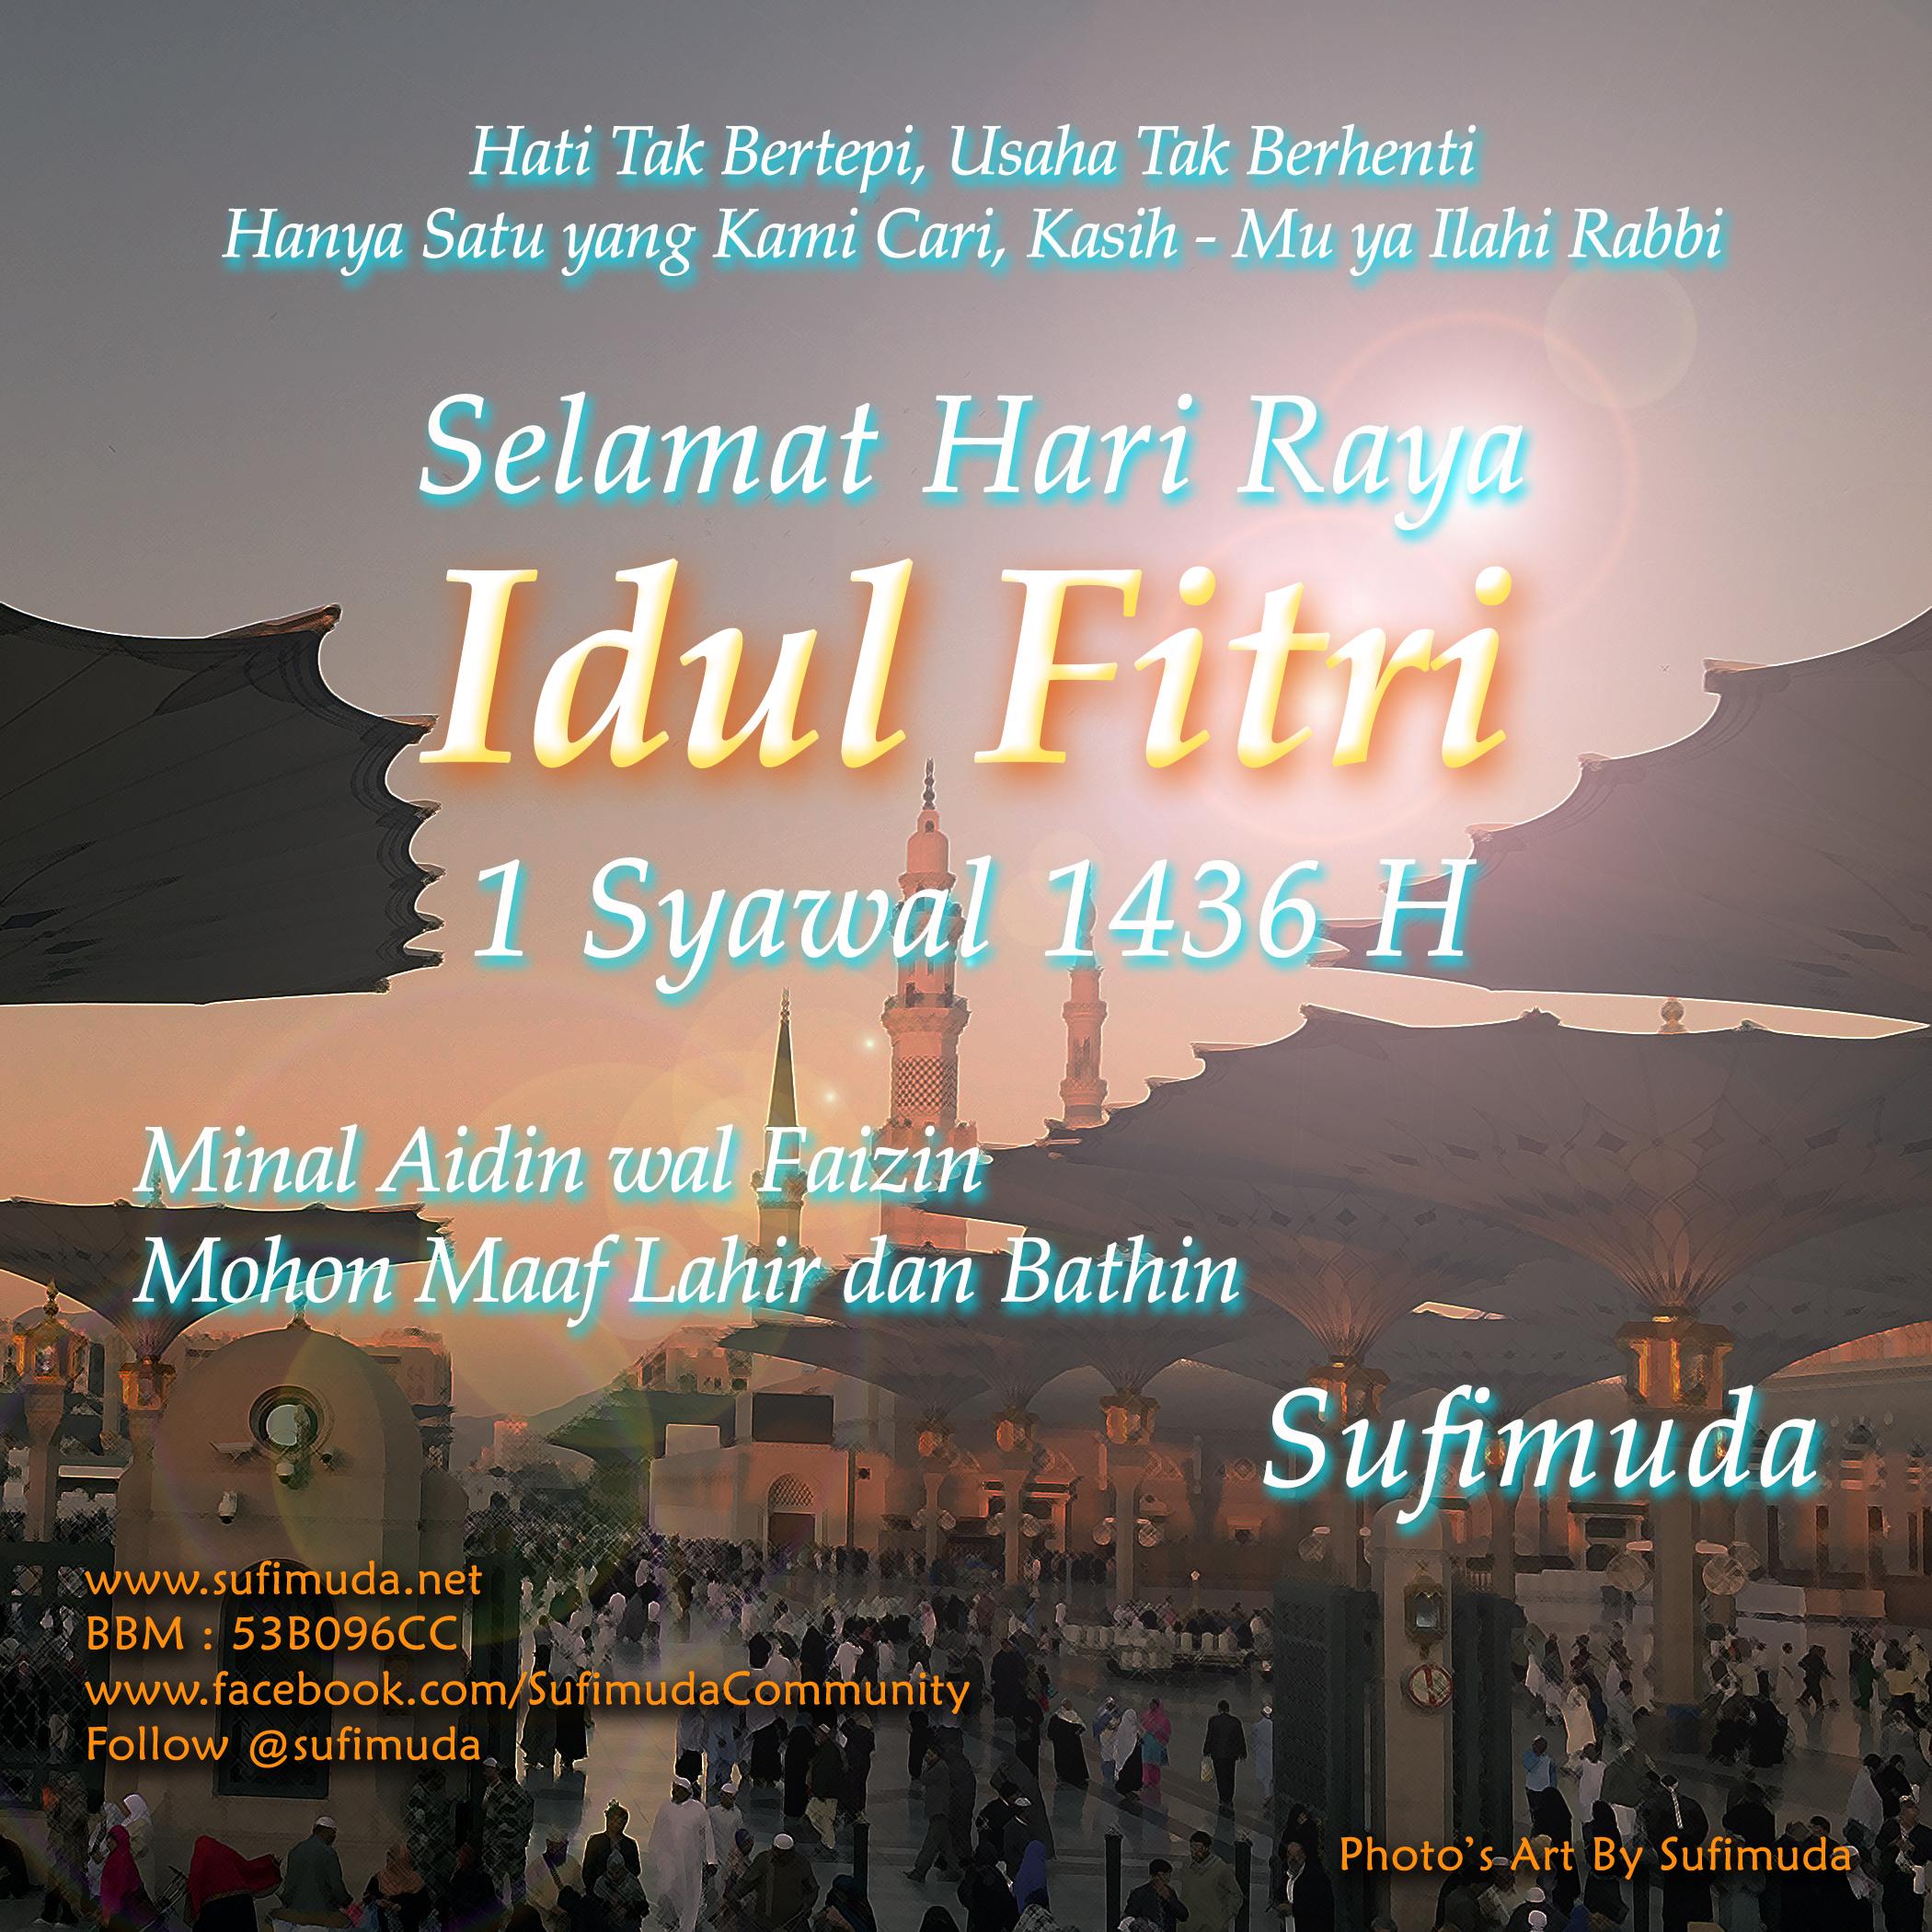 Selamat Idul Fitri, SMoga Mencapai Derajat Taqwa Dan